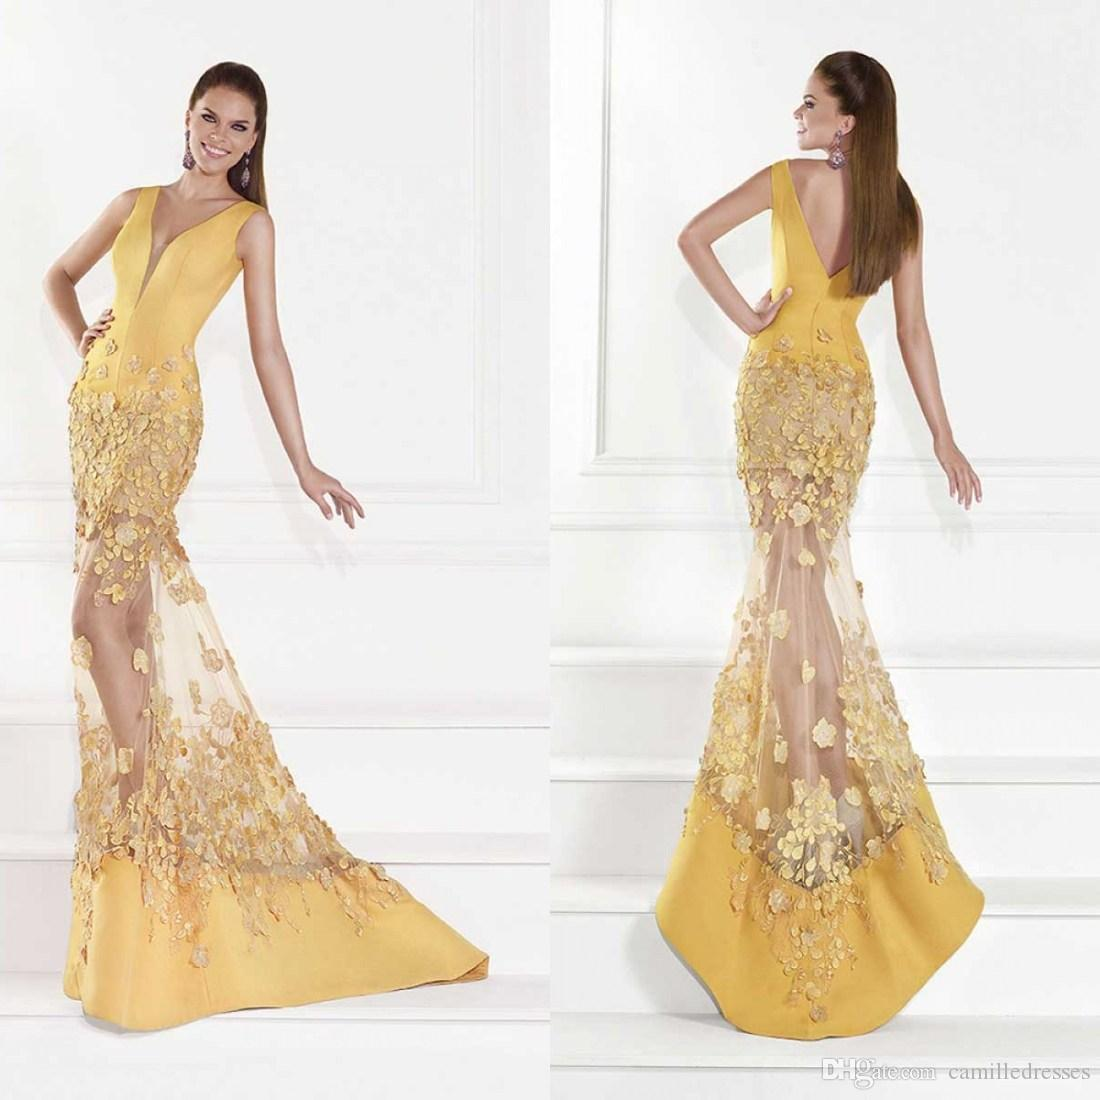 Dhgate Wedding Dress 53 Stunning